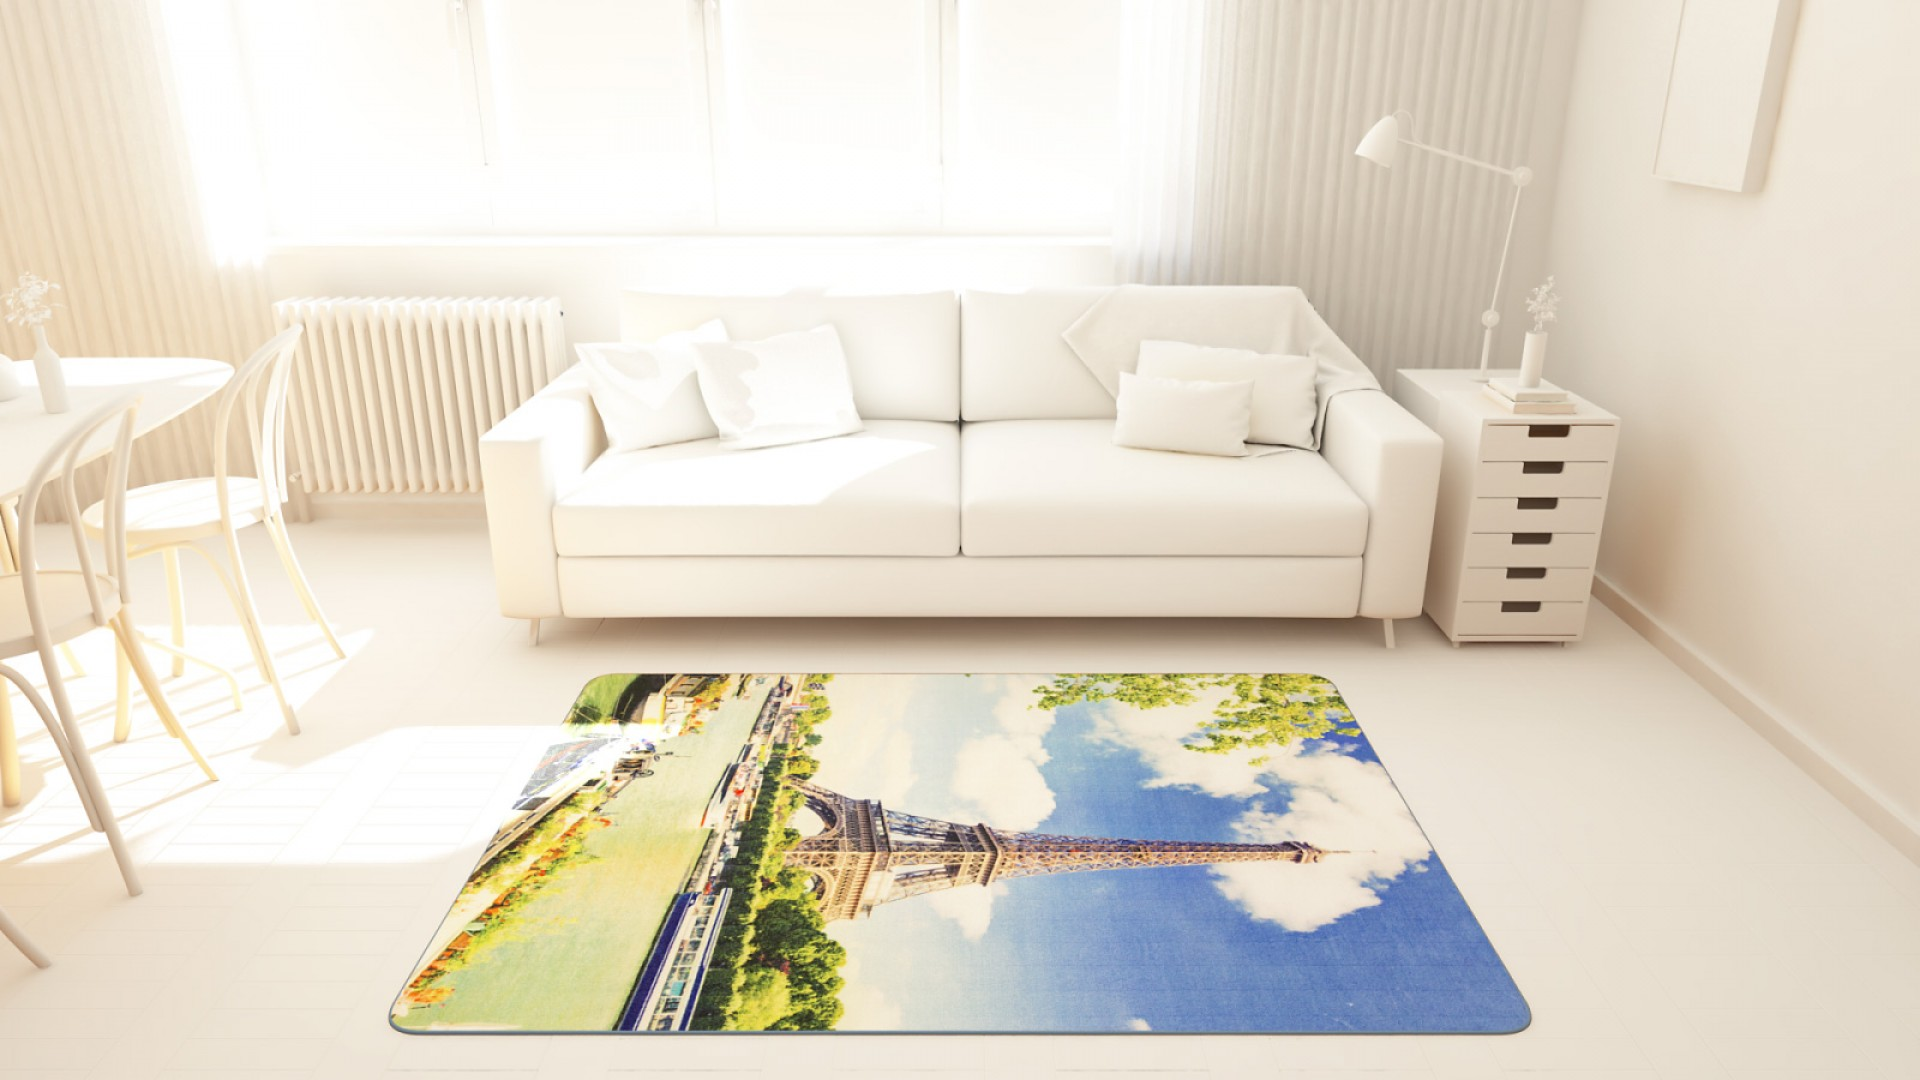 Tapis salon LIGNE PHOTOGRAPHE seine tour eiffel bleu DEBONSOL